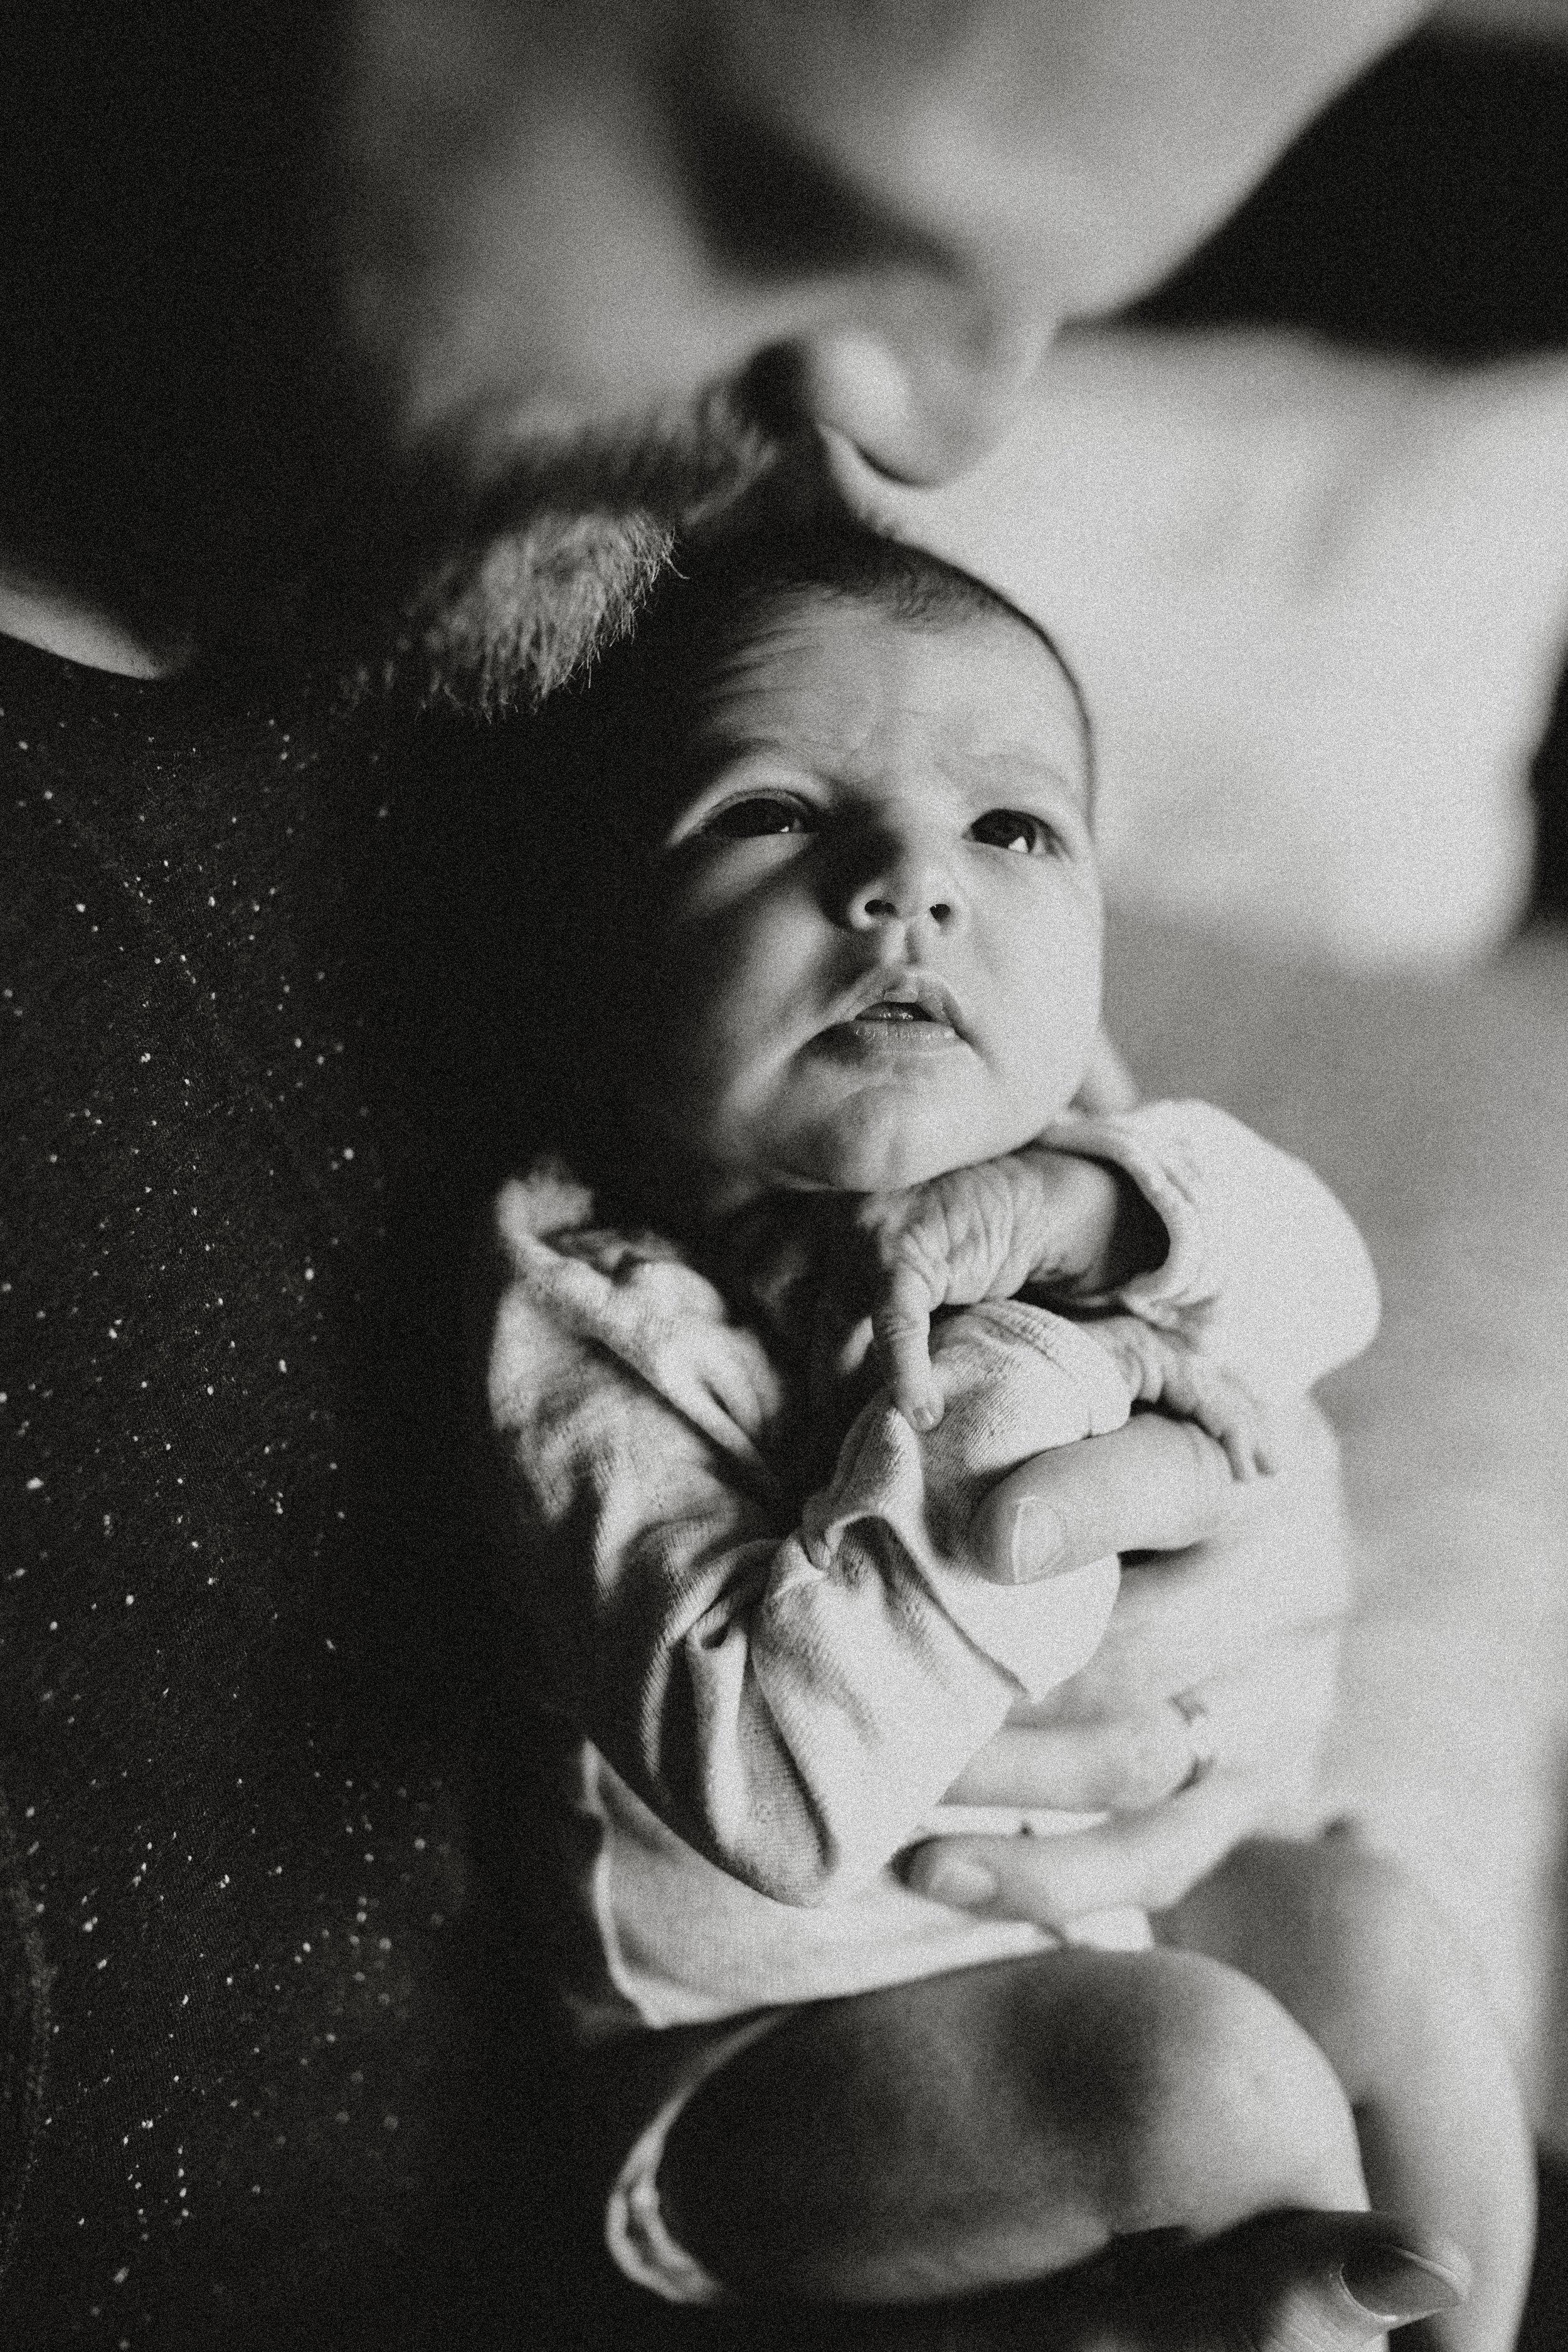 Newborn-Photographer-Bellingham-WA-Brianne-Bell-Photograpy-(Ila)-61.jpg